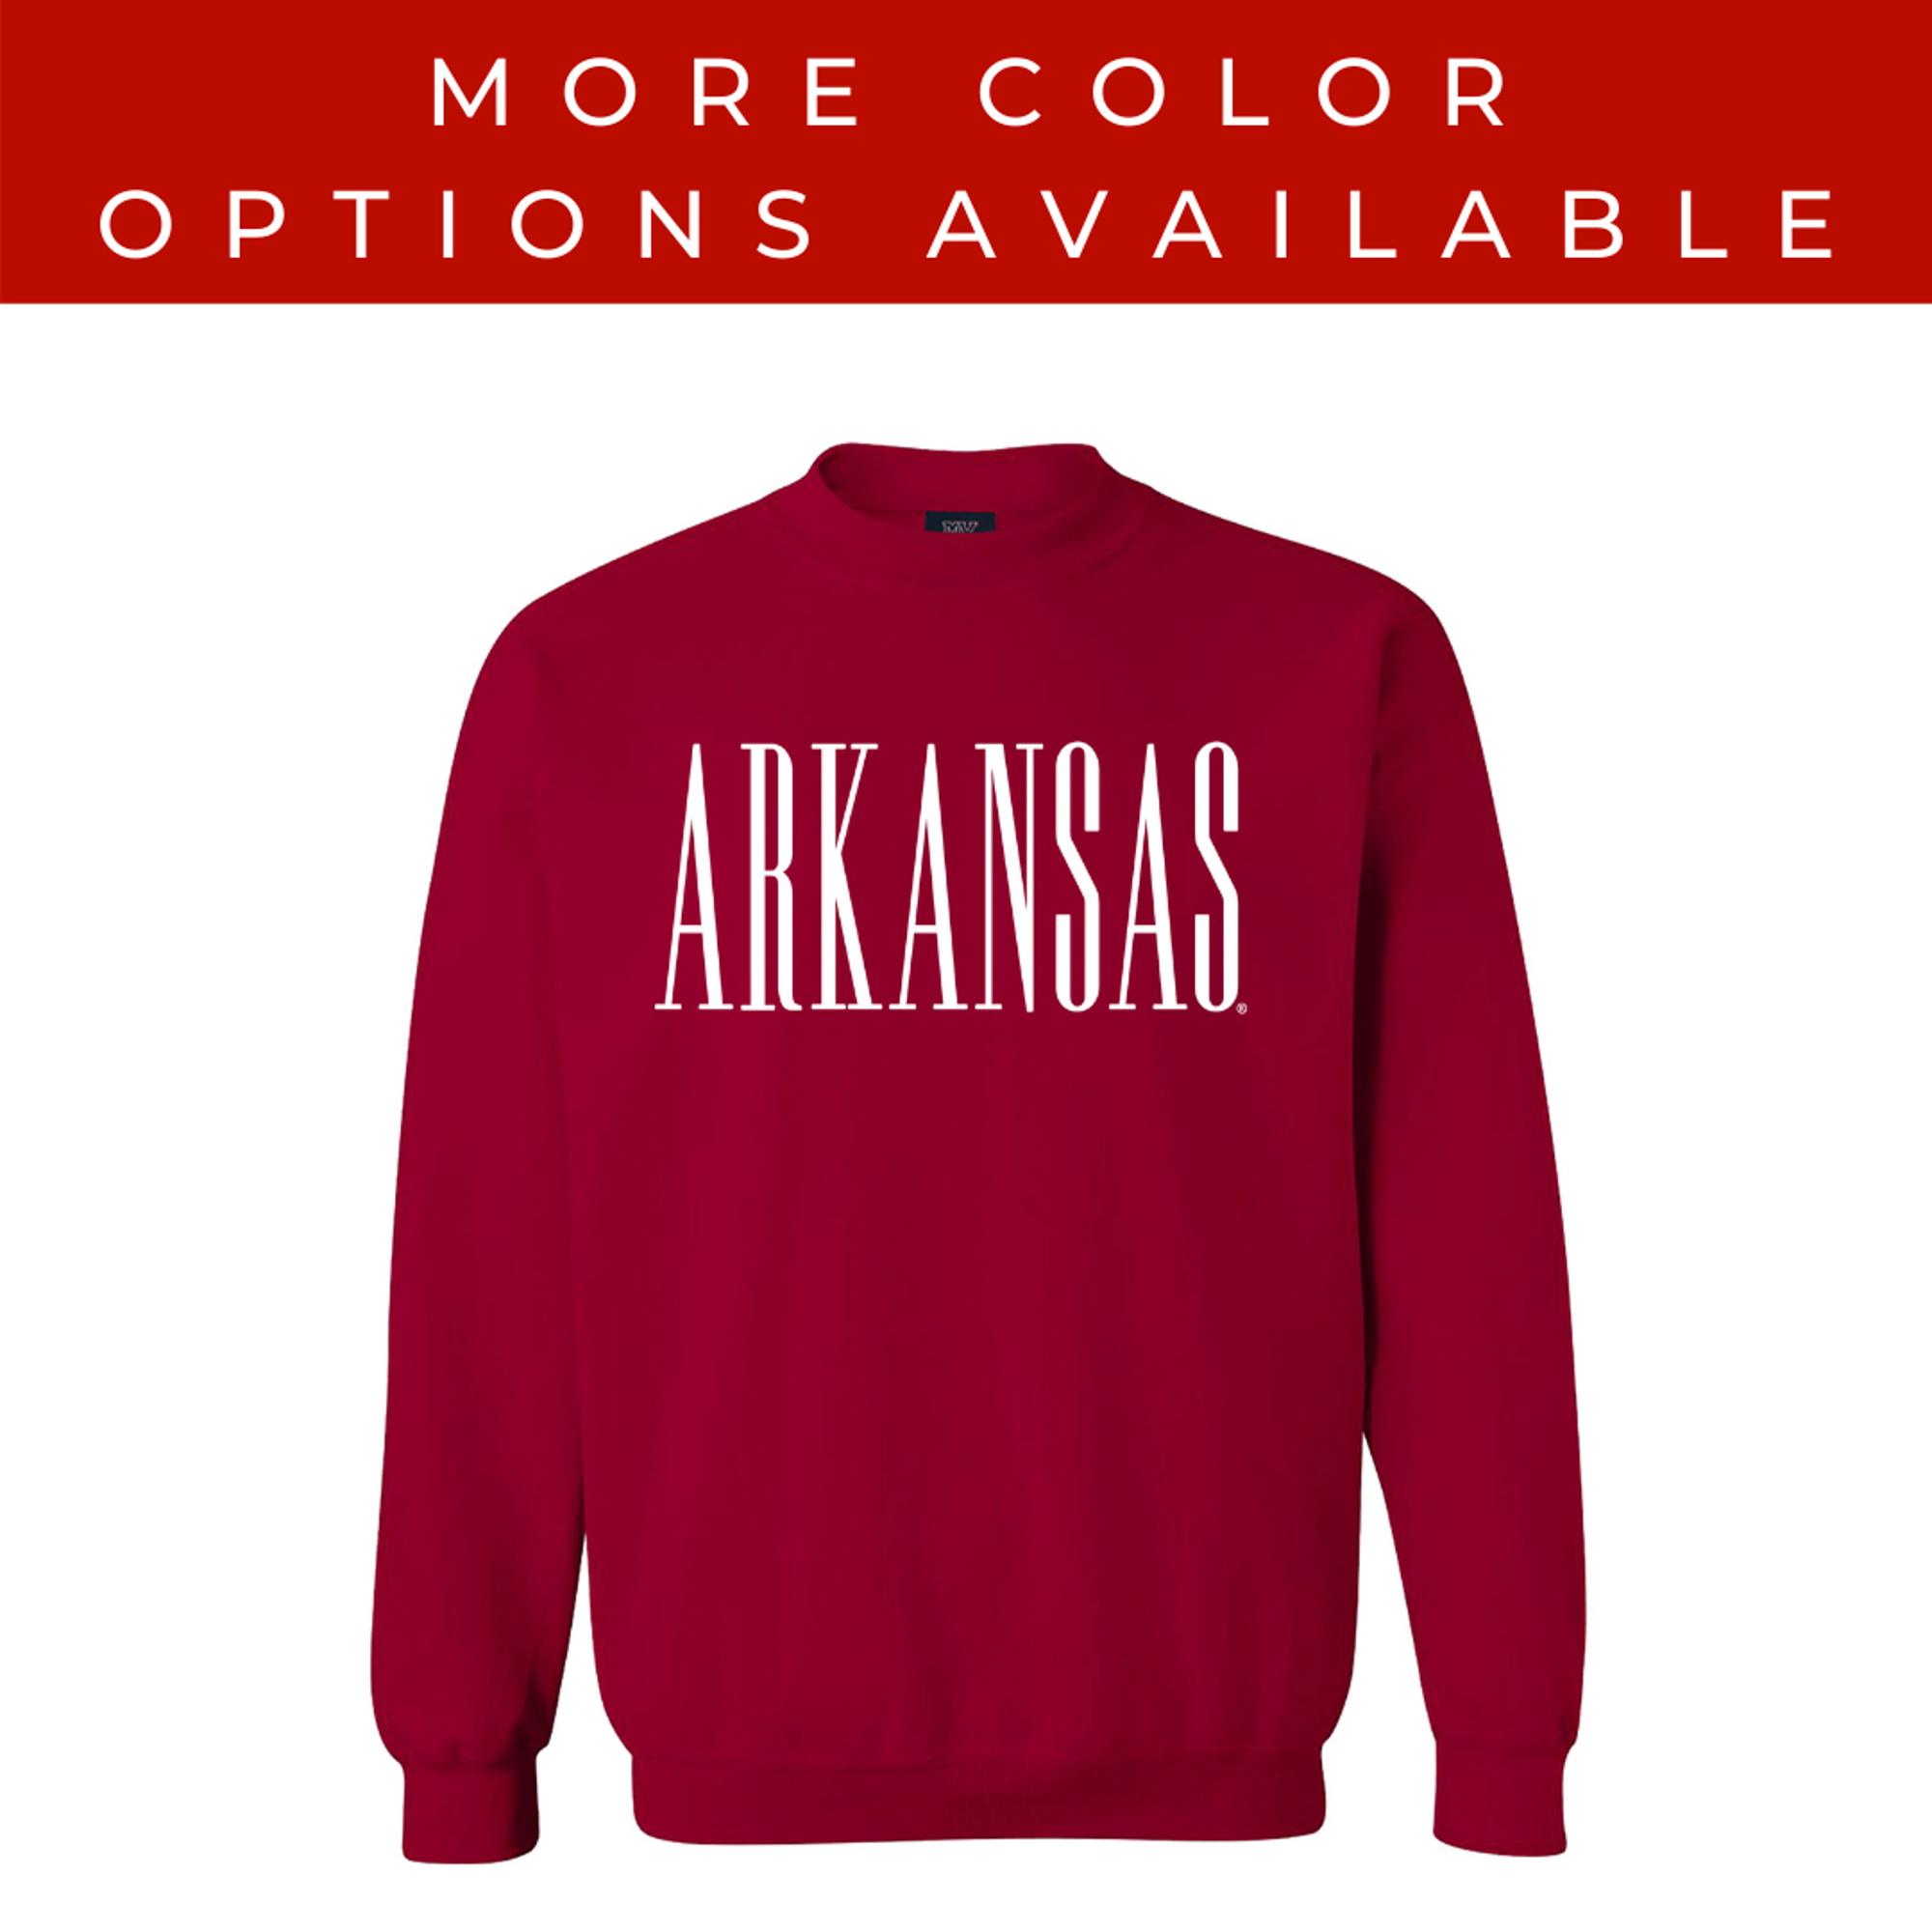 image of: Arkansas Tall Letter Fundamental Crew Sweatshirt